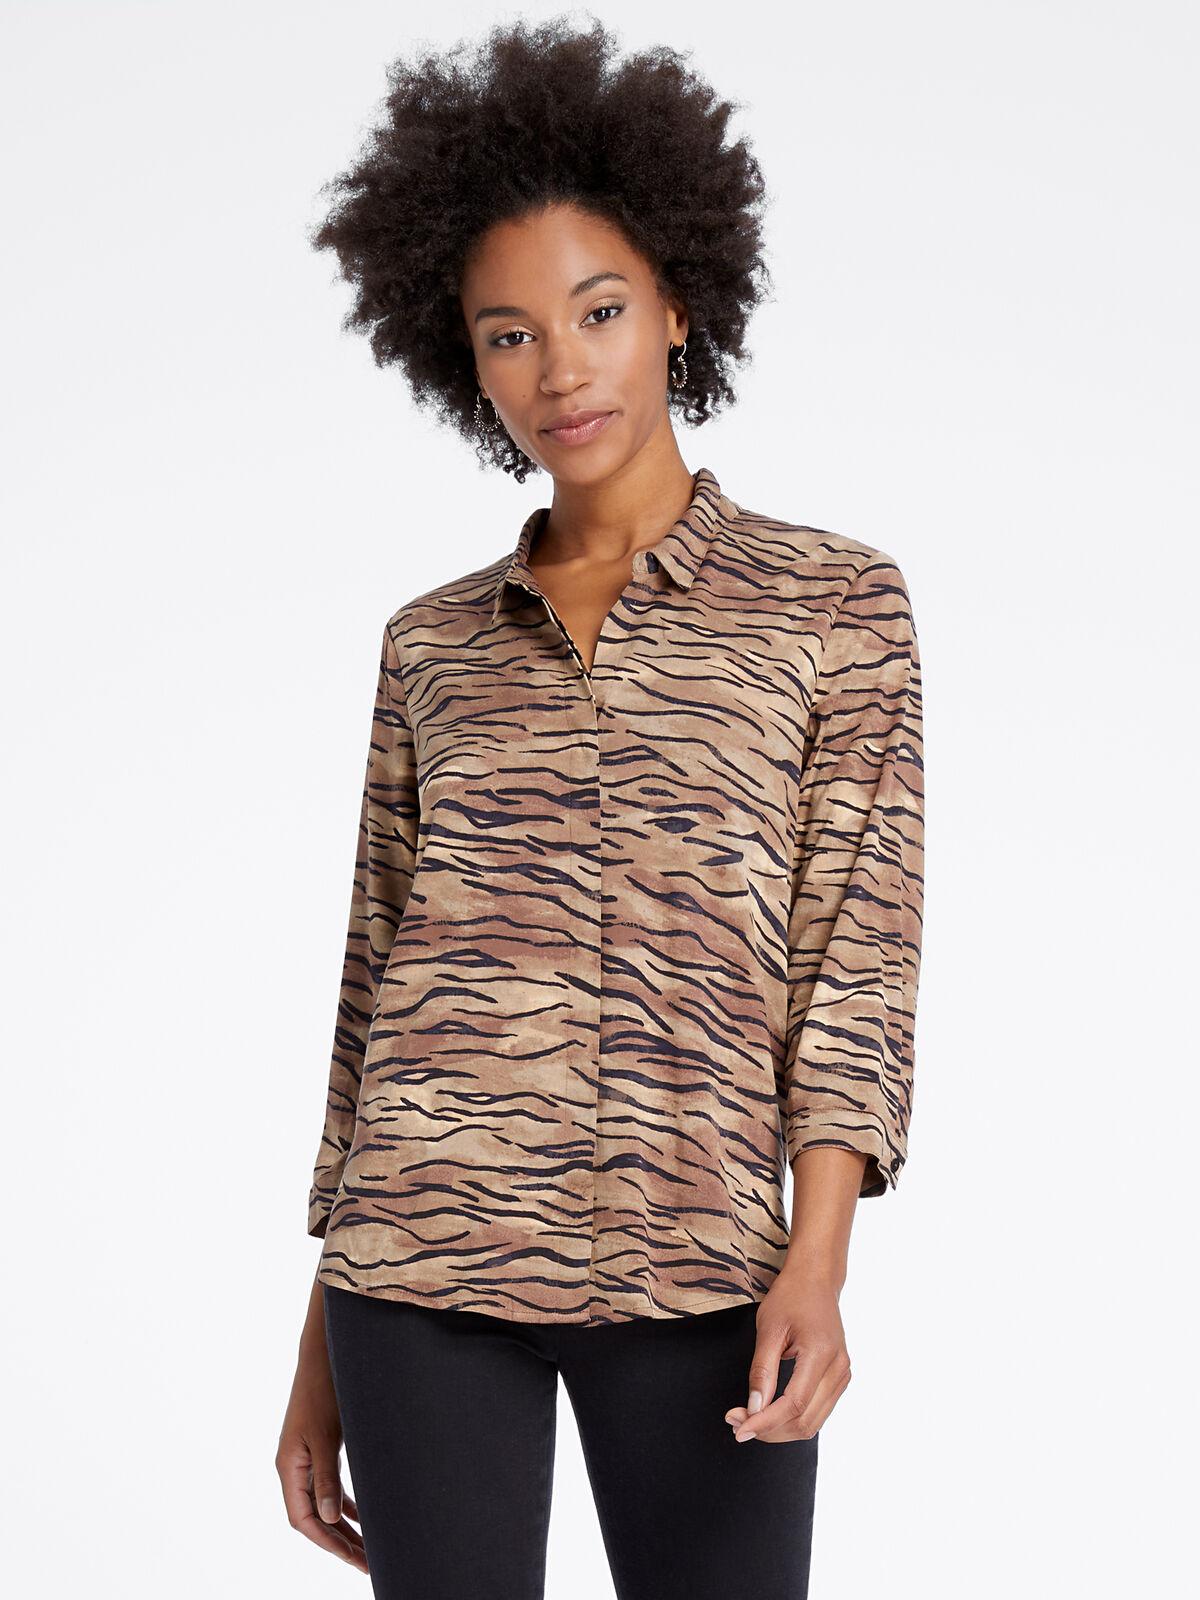 Tiger Stripes Shirt